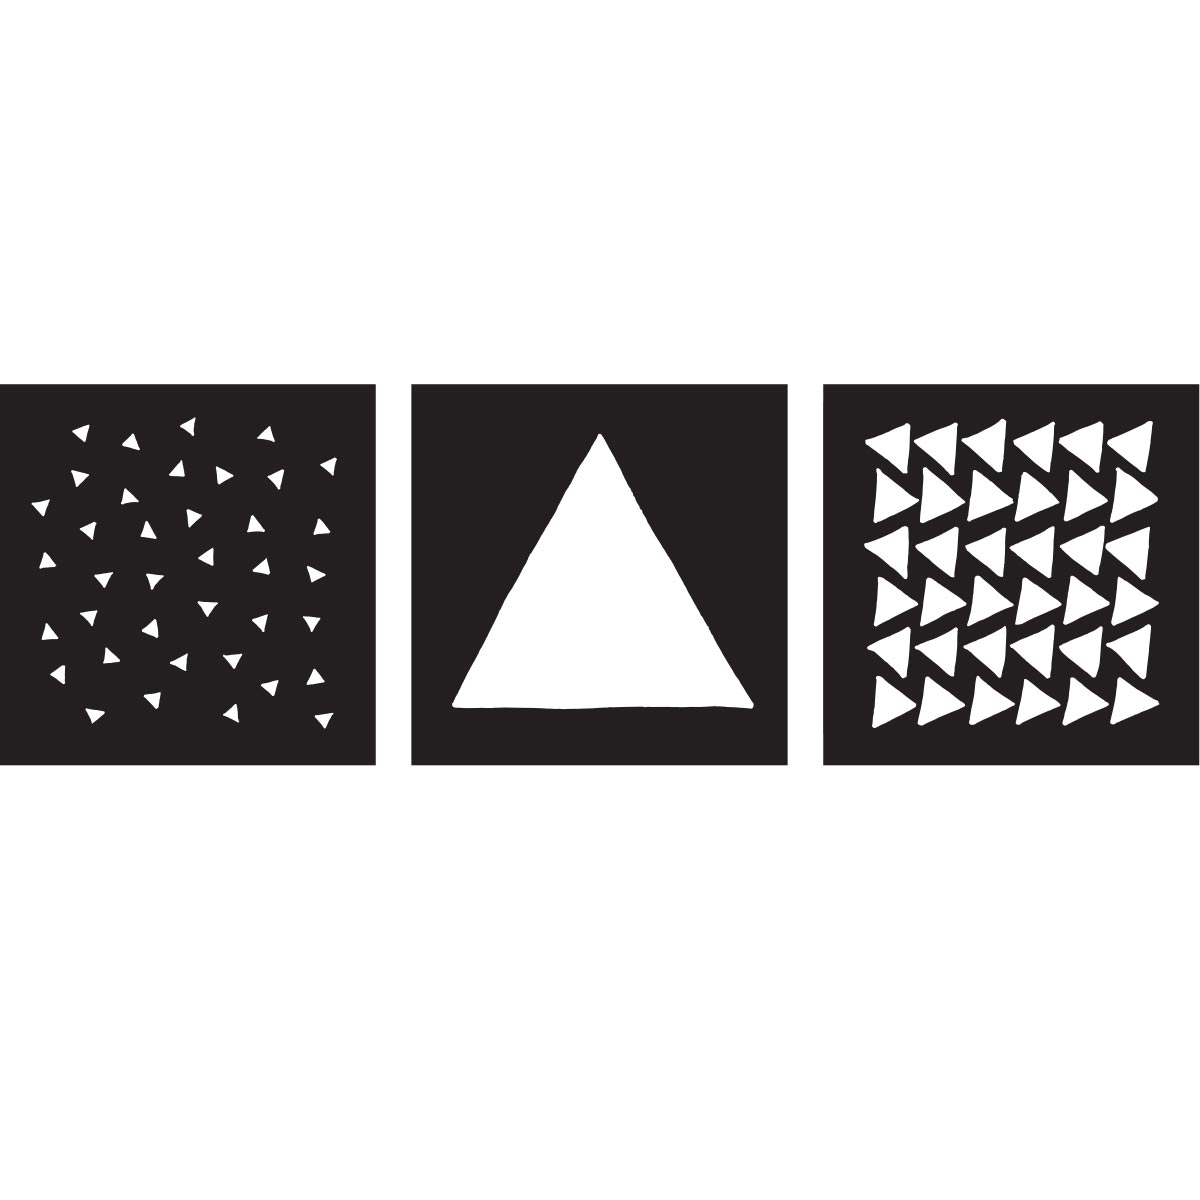 FolkArt ® Craft Stencils - Value Packs - Triangles - 25621